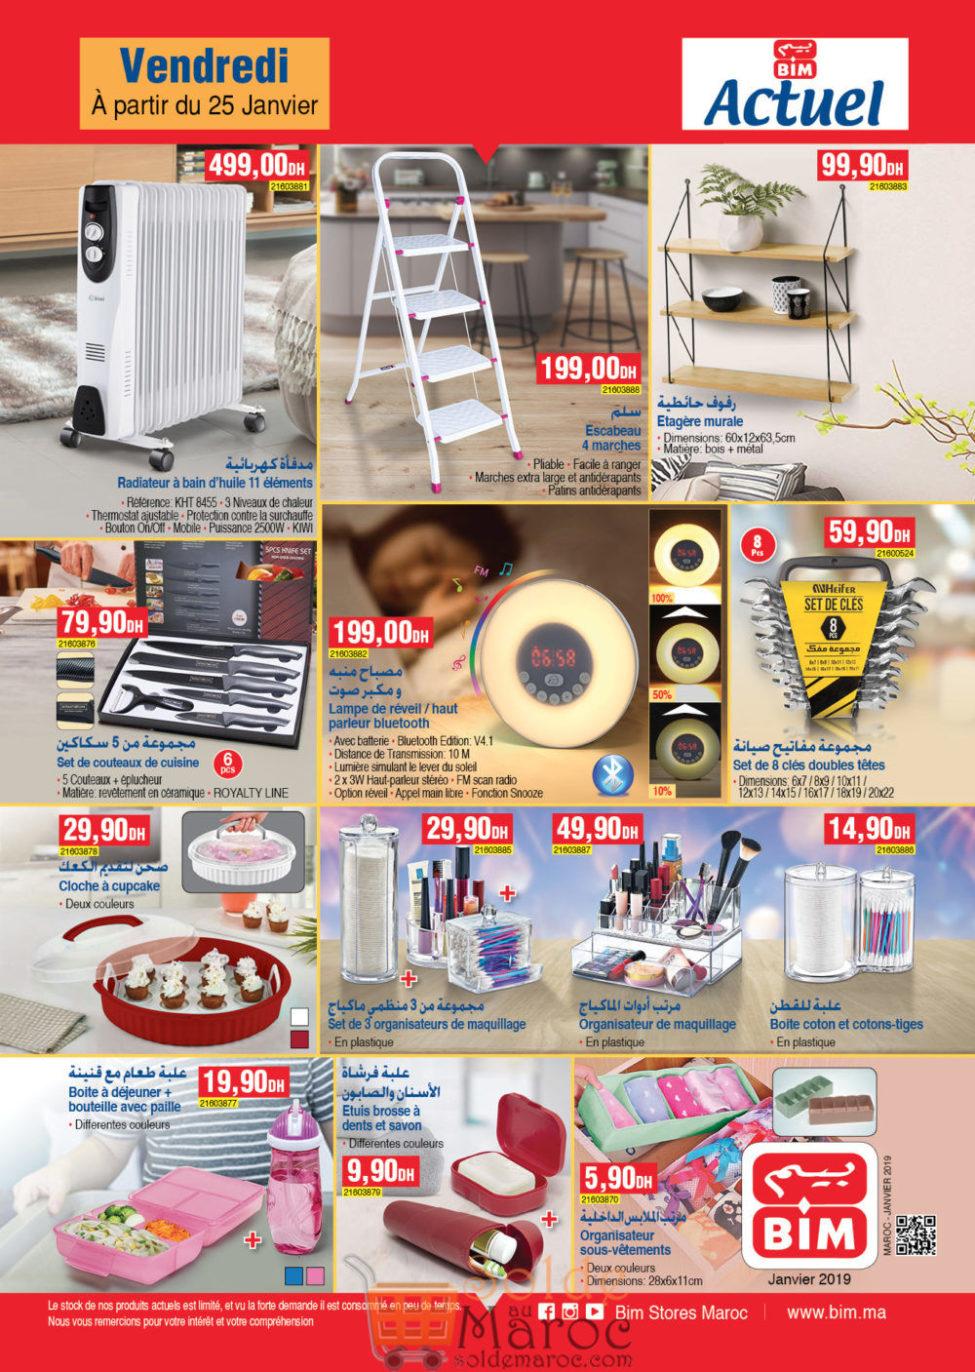 Catalogue Bim Maroc du Vendredi 25 Janvier 2019